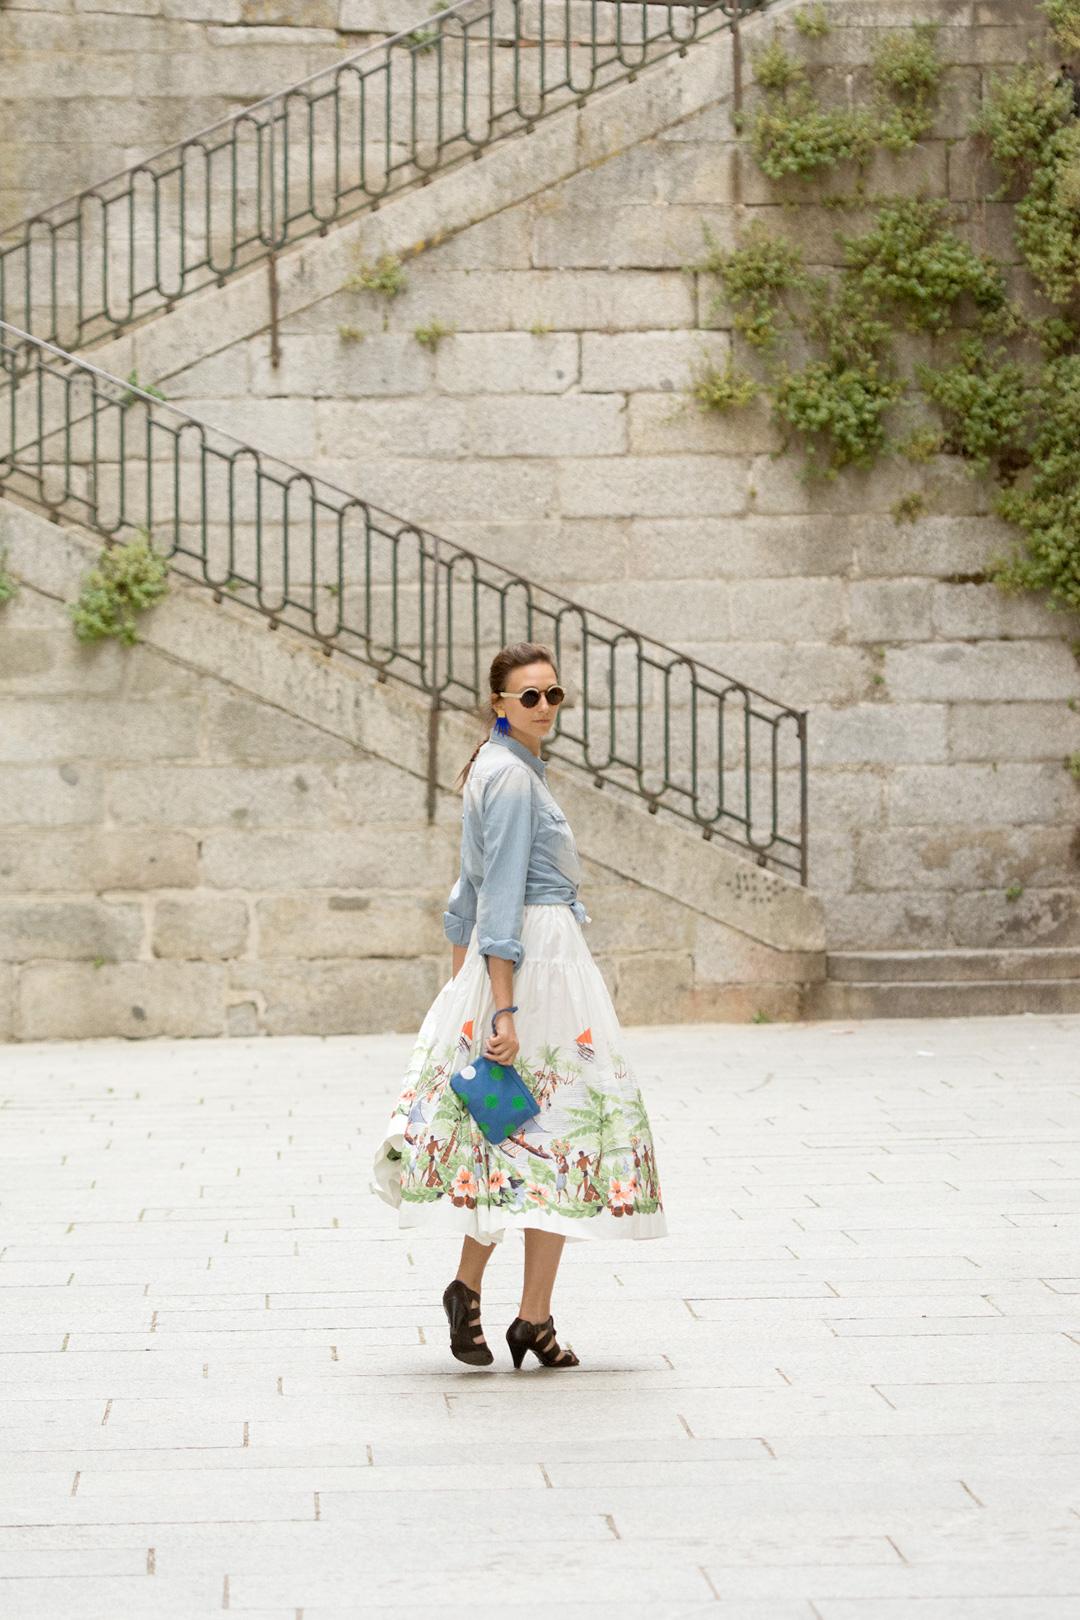 amalfi-leonor-gabala-street-style-mitmeblog-1080-12